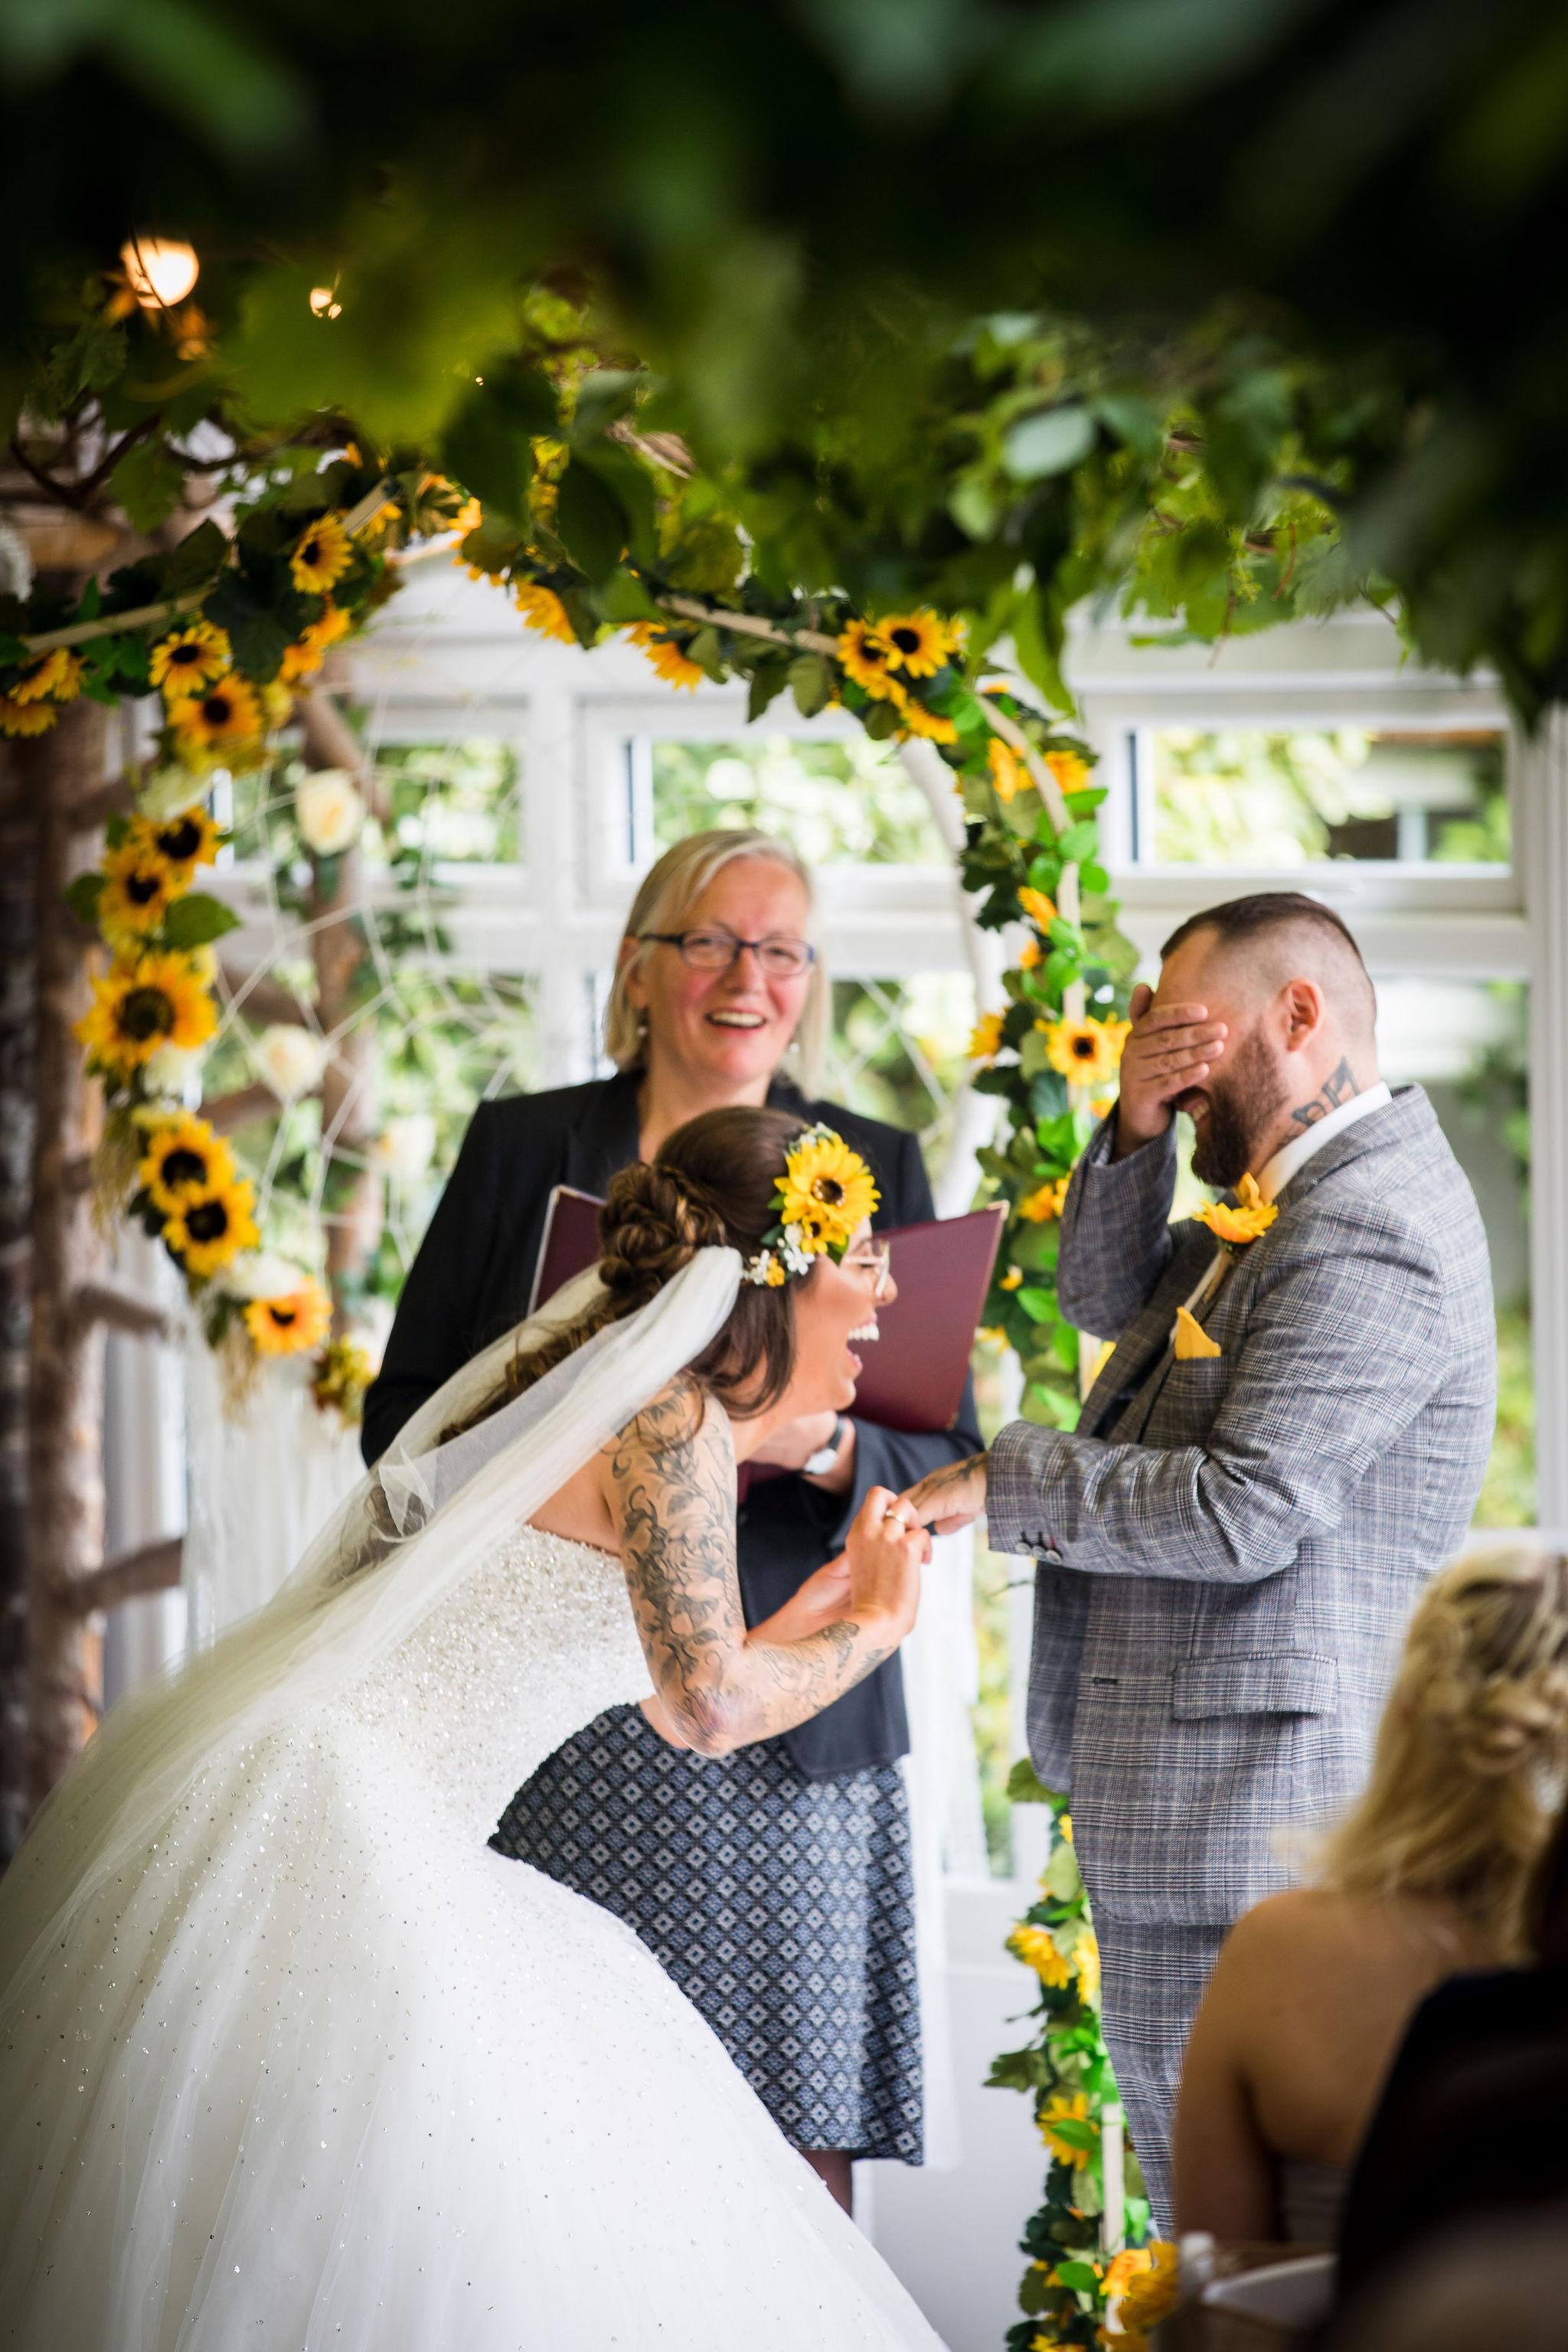 Harriet&Rhys Wedding - Magical sunflower wedding - quirky wedding with dodgems (26)